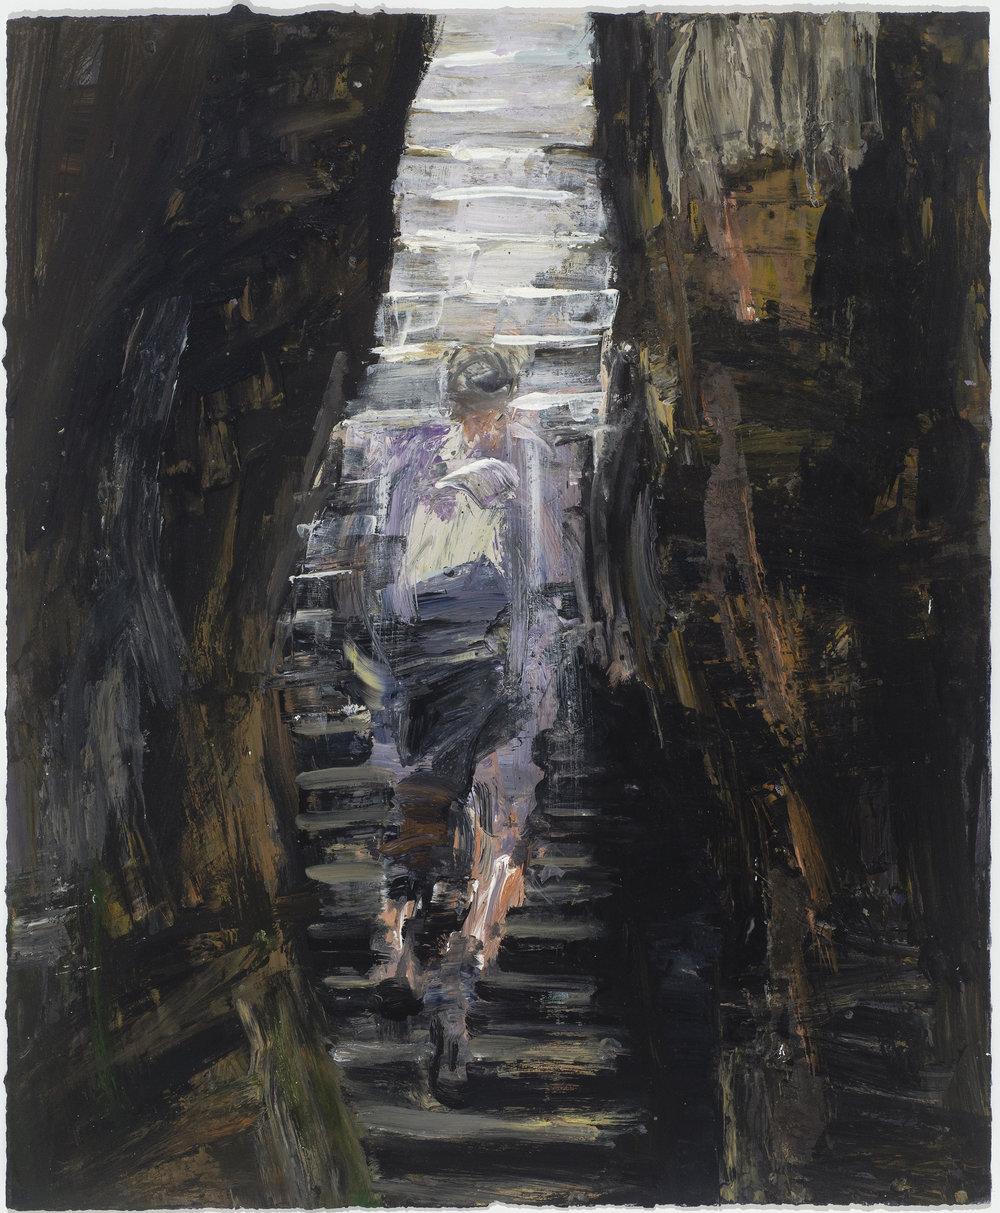 Climbing (internal) stairs  攀爬(穴內的)樓梯   Euan Macleod , 2016  Acrylic on paper, 80 x 66 cm, HKD 29,300 framed